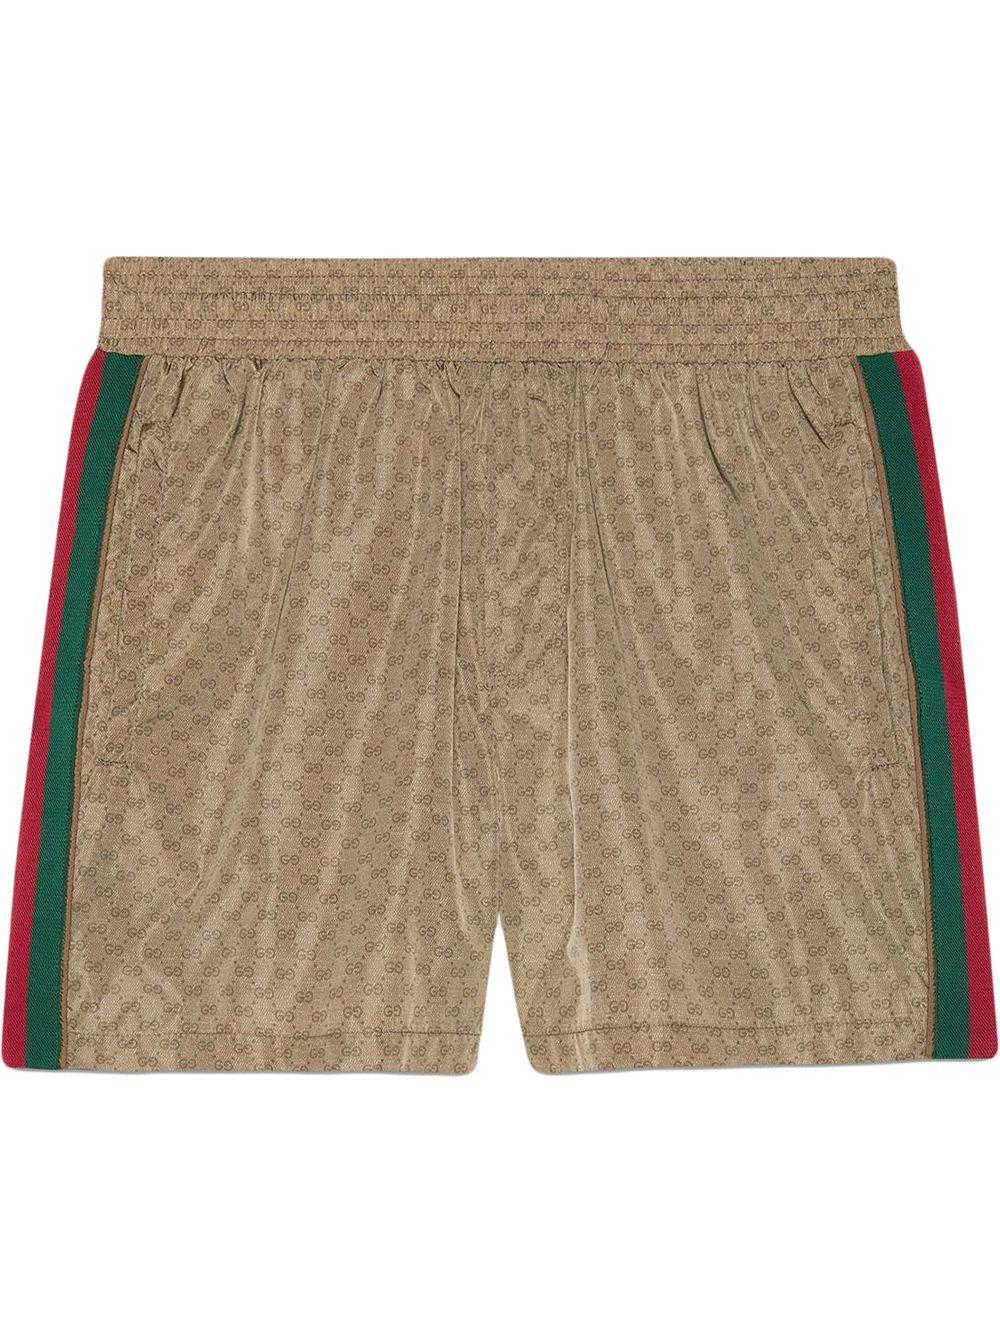 Shorts gg supreme in nylon